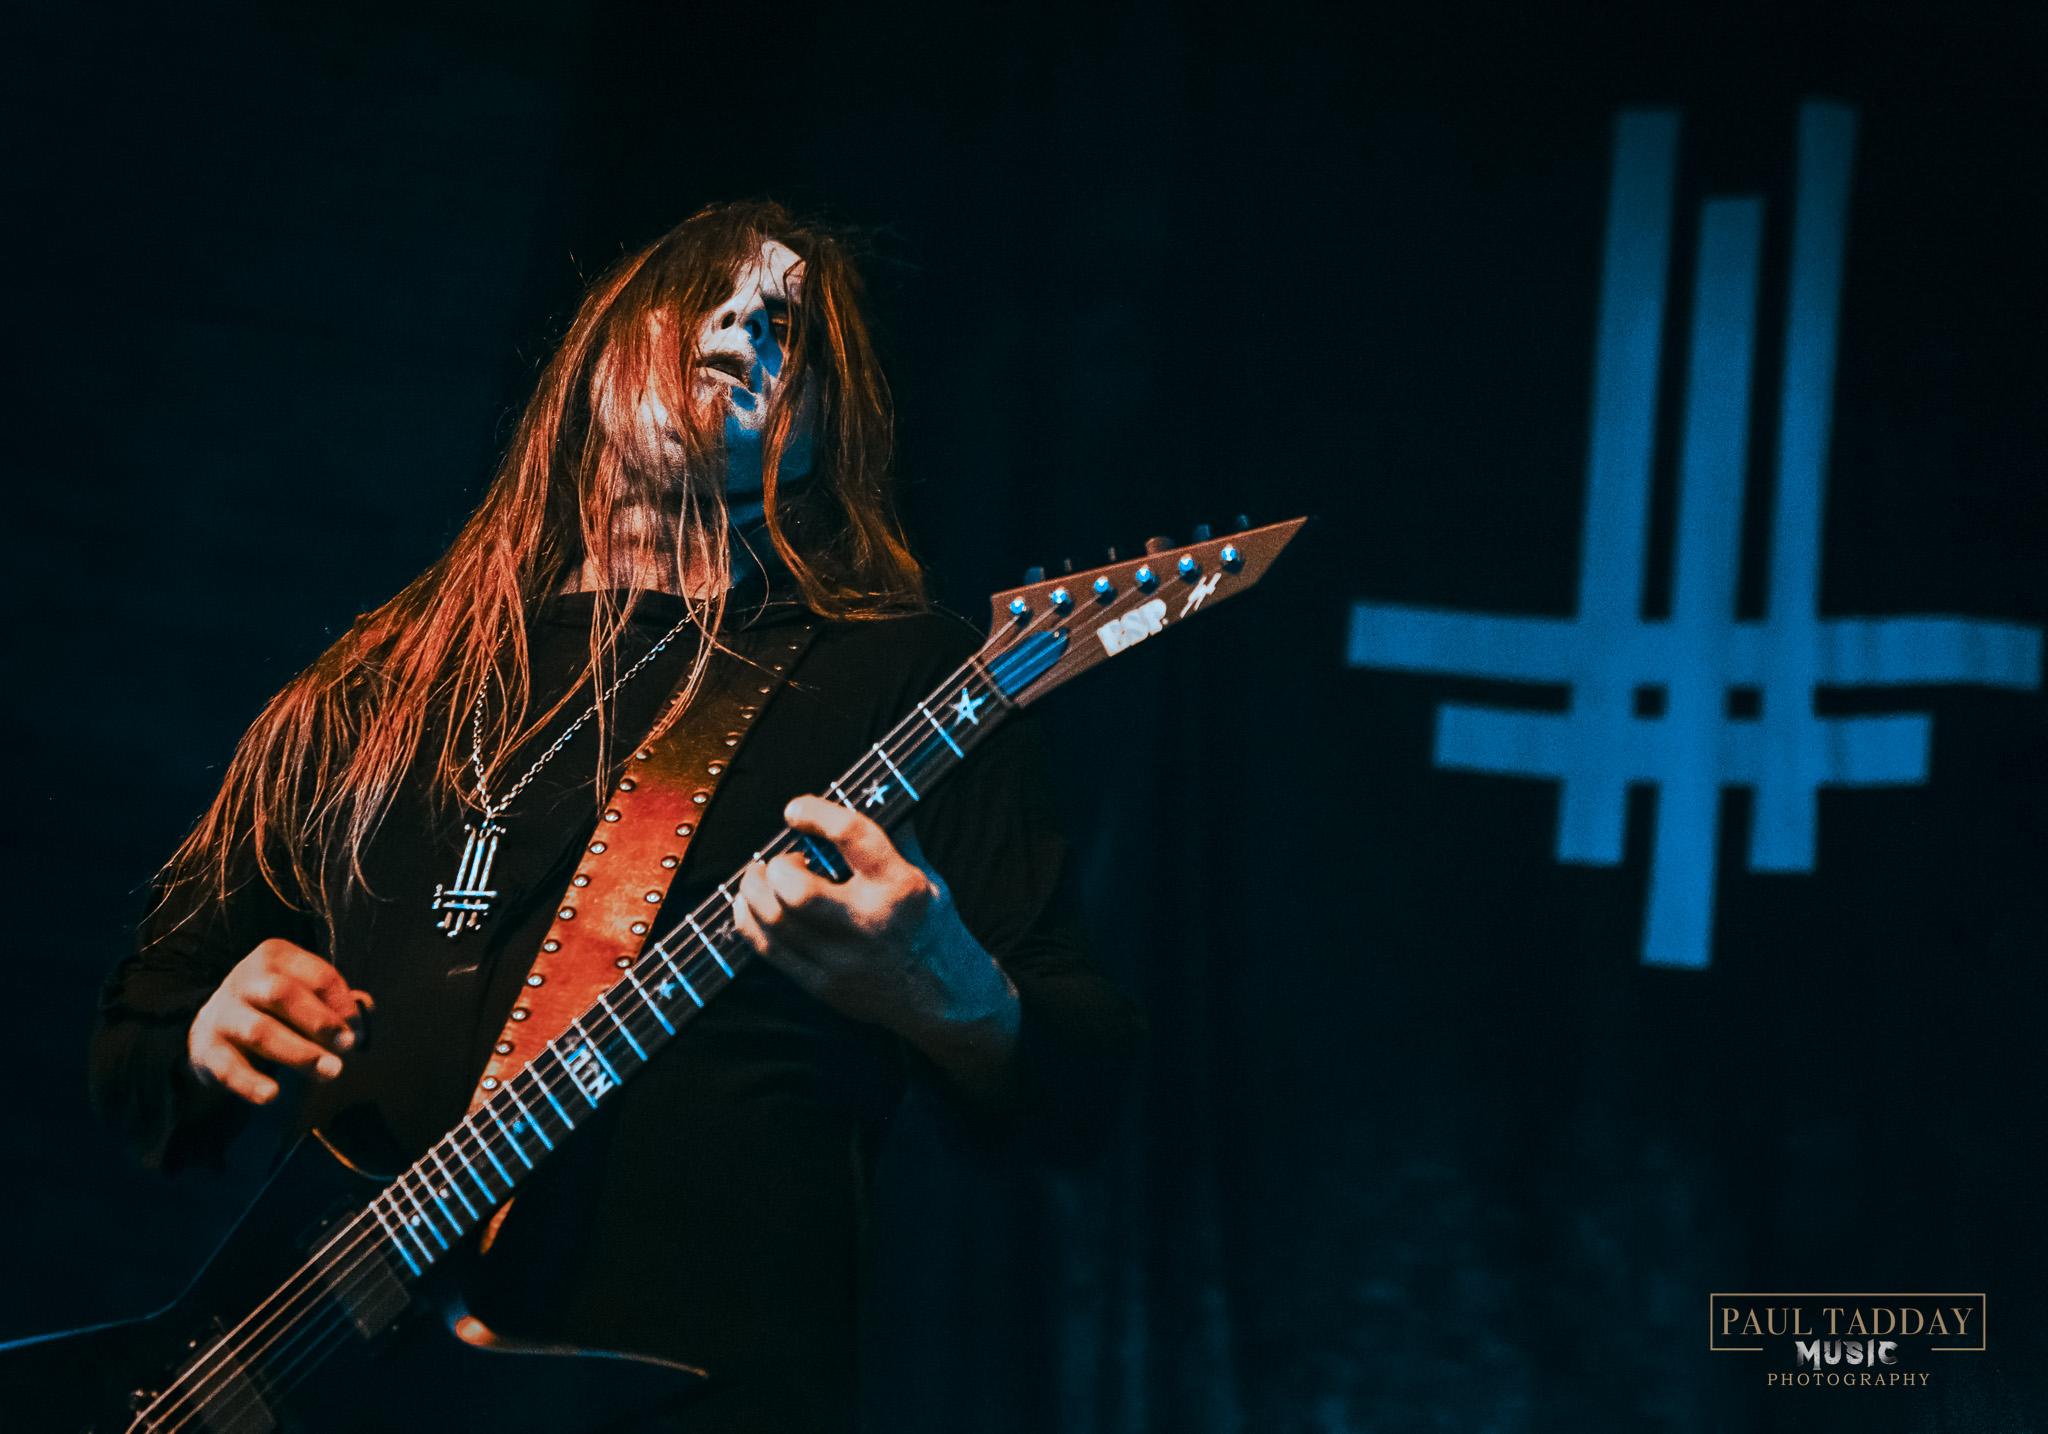 behemoth - brisbane - march 7 2019 - web - paul tadday photography - 42.jpg